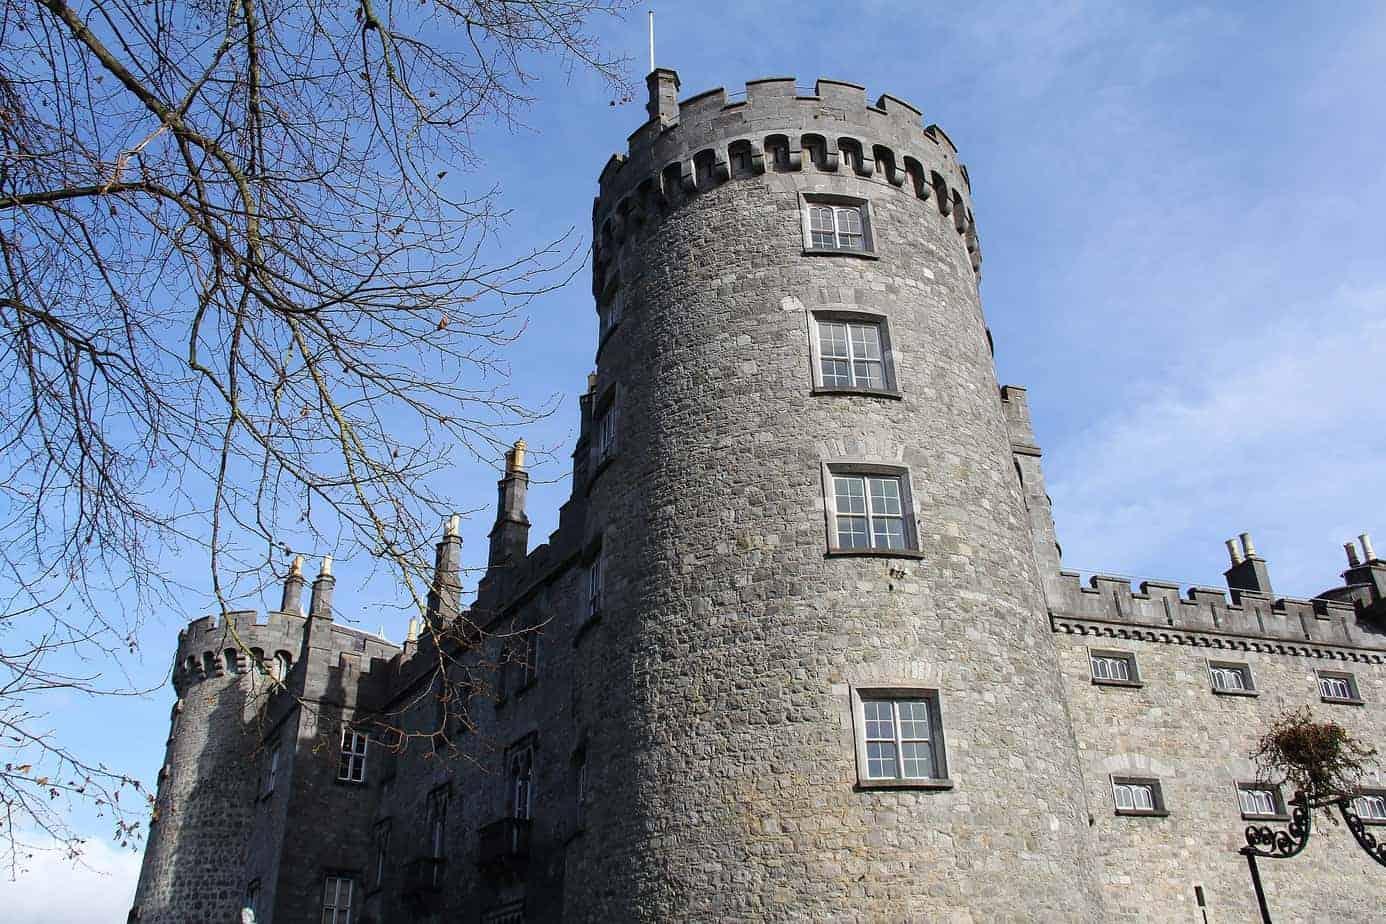 The great Kilkenny Castle